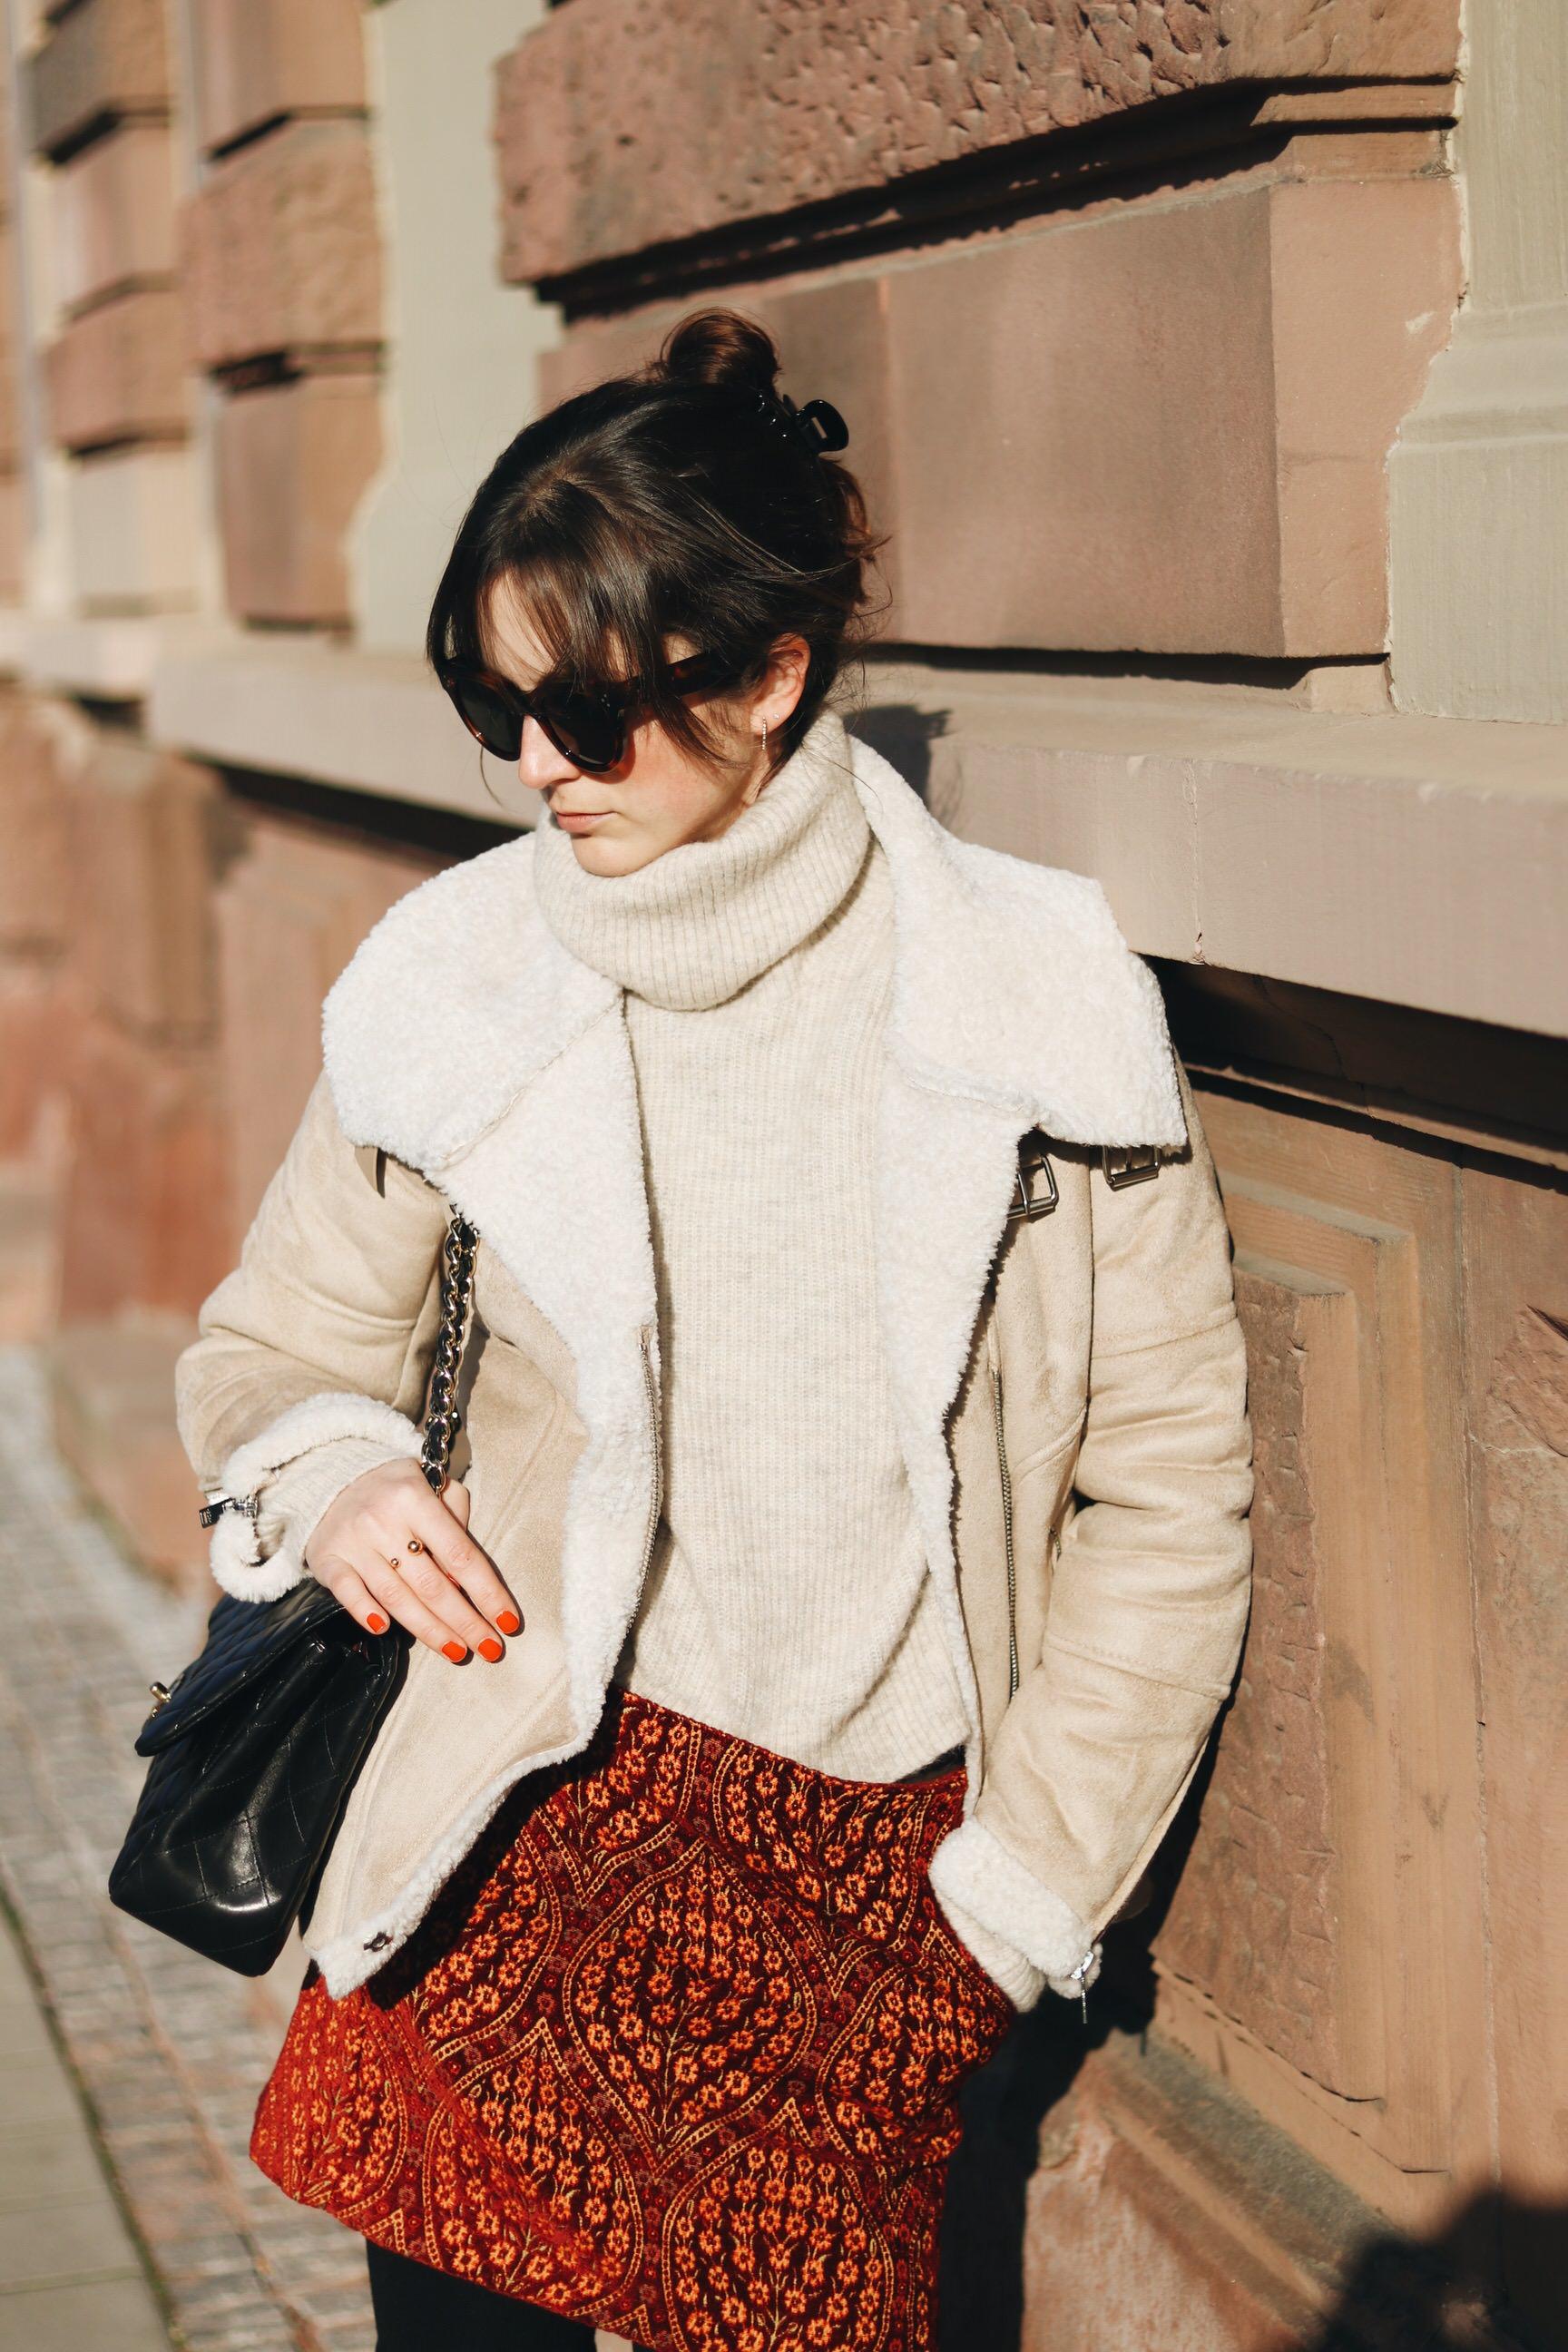 Lammfell Jacke kombinieren Winter Outfit Ideen Minirock Celine Sonnenbrille Blog Fashionblog